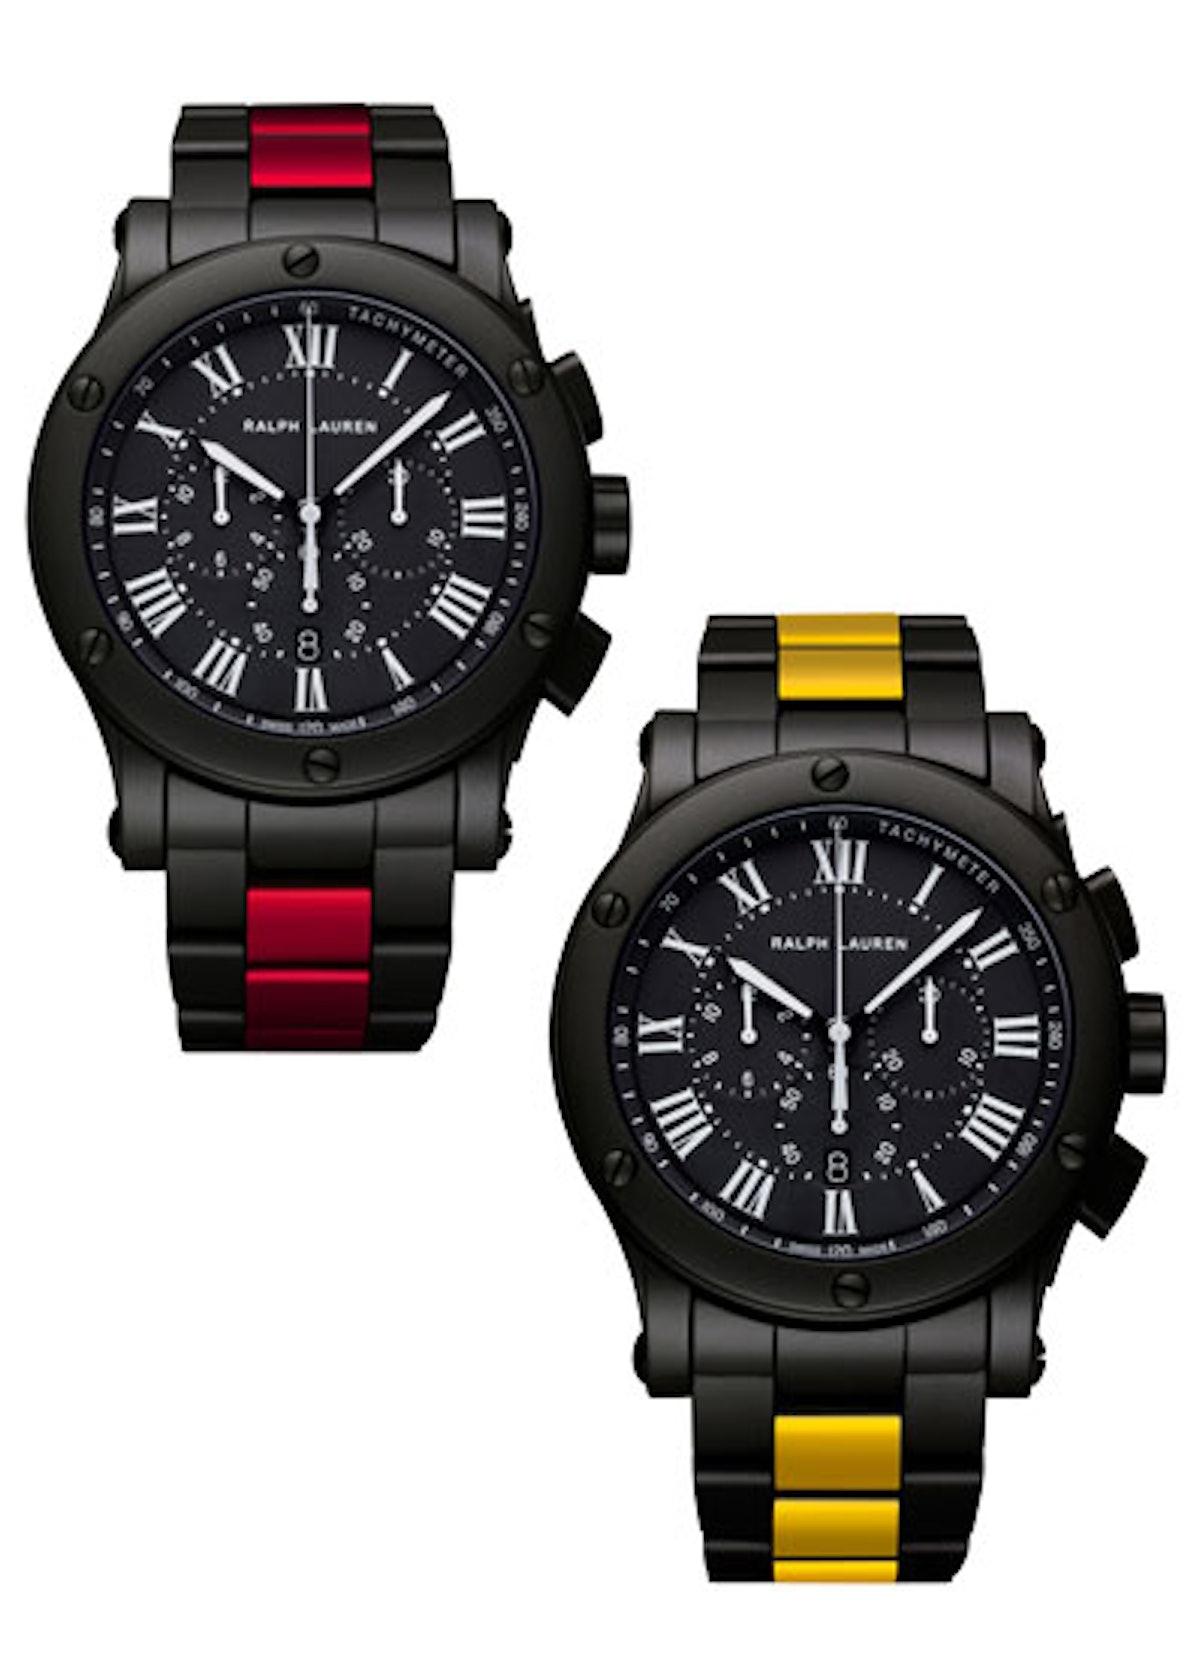 acss-geneva-watches-02-v.jpg